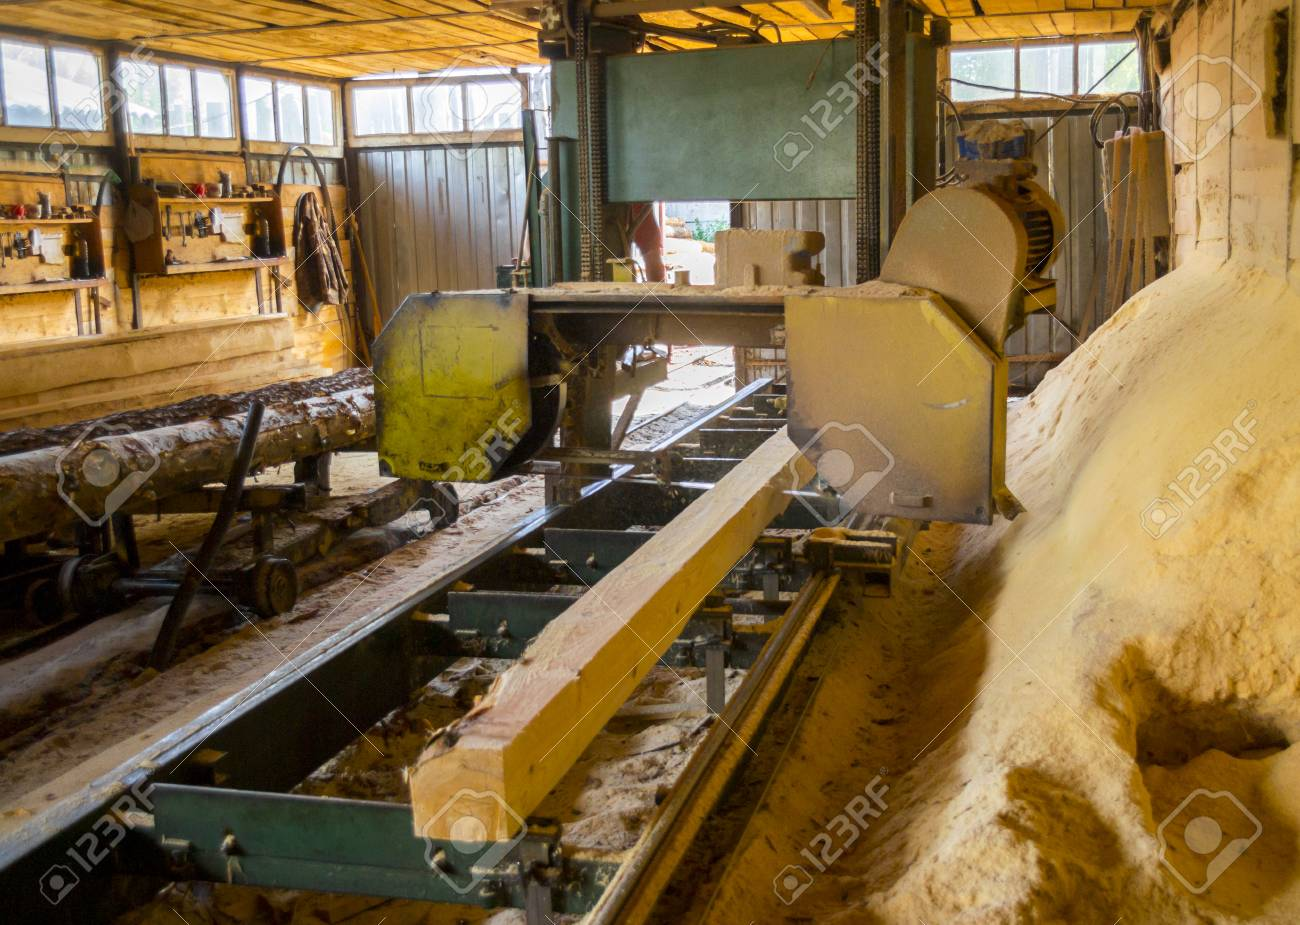 Sawmill  Process of machining logs in equipment sawmill machine